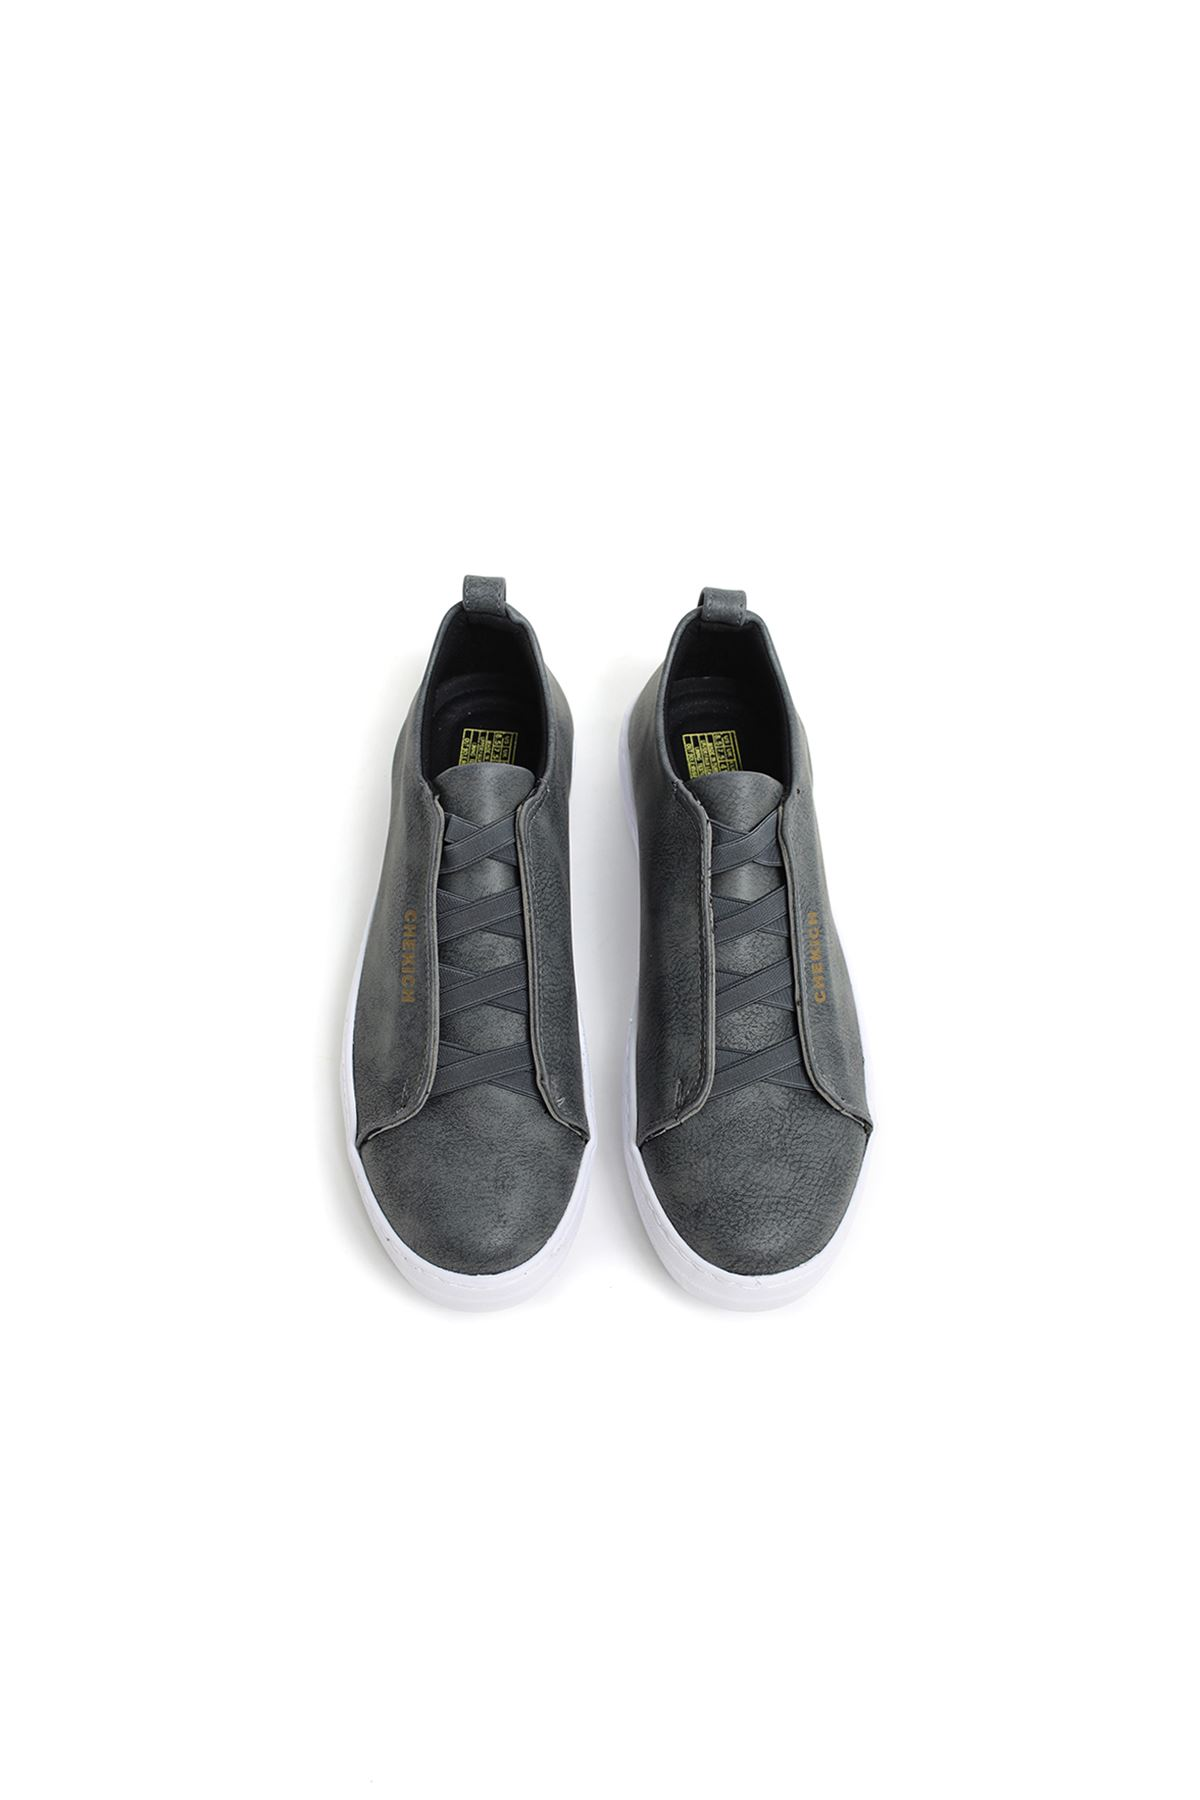 Chekich CH013 BT Erkek Ayakkabı ANTRASIT